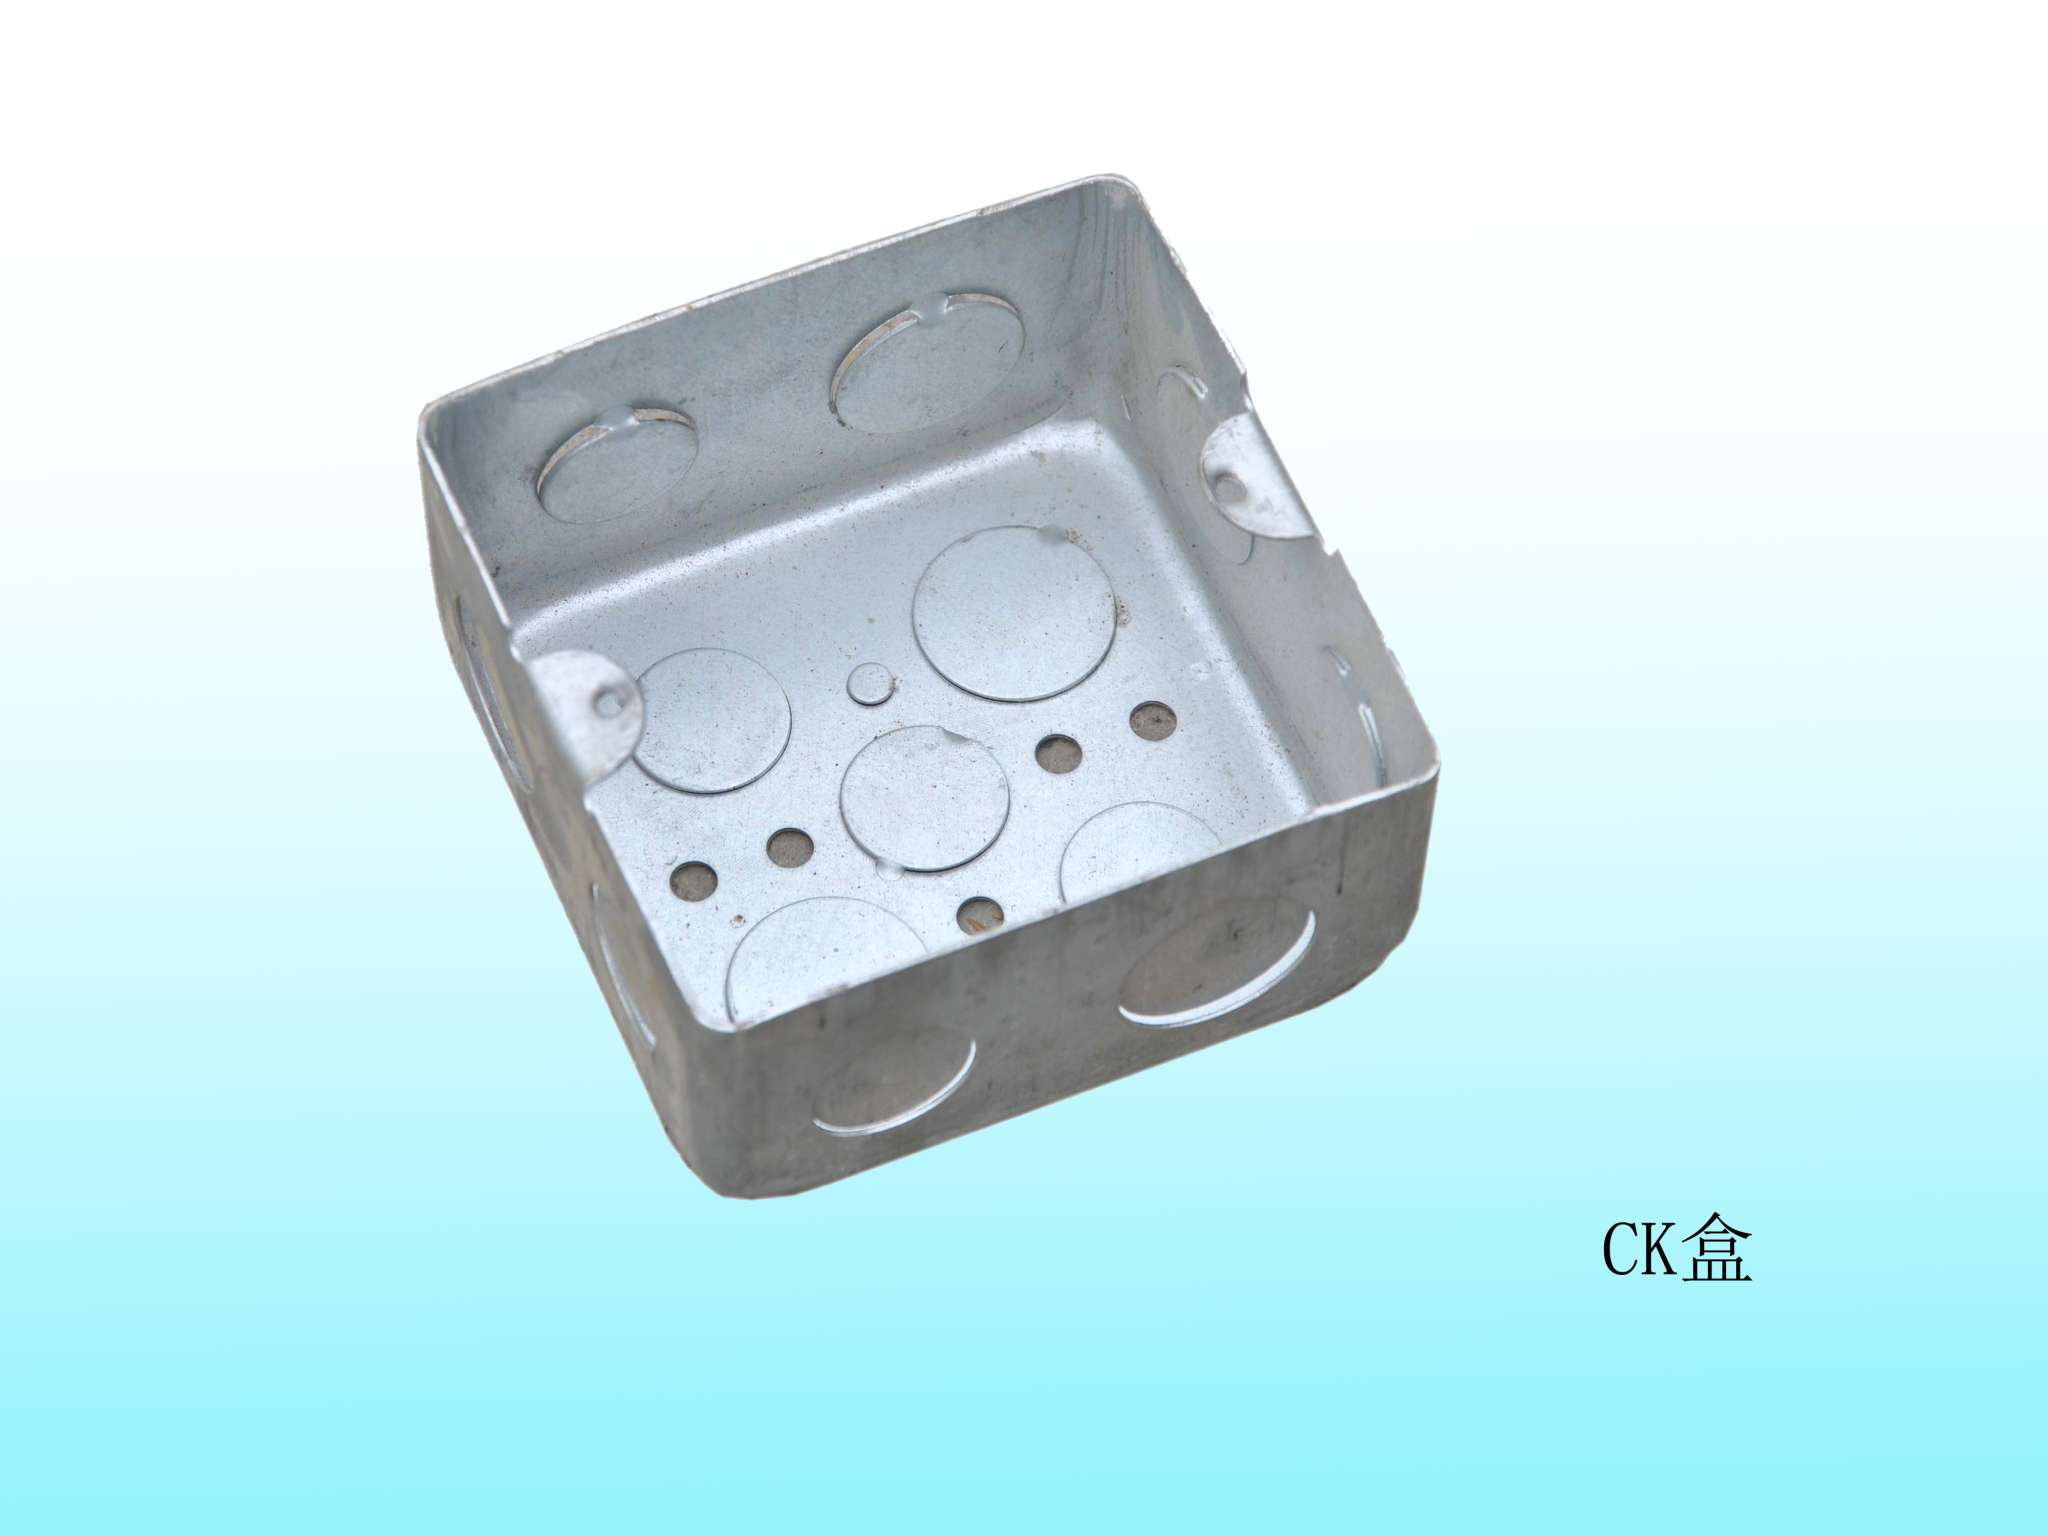 ck29f68pa-01电路图